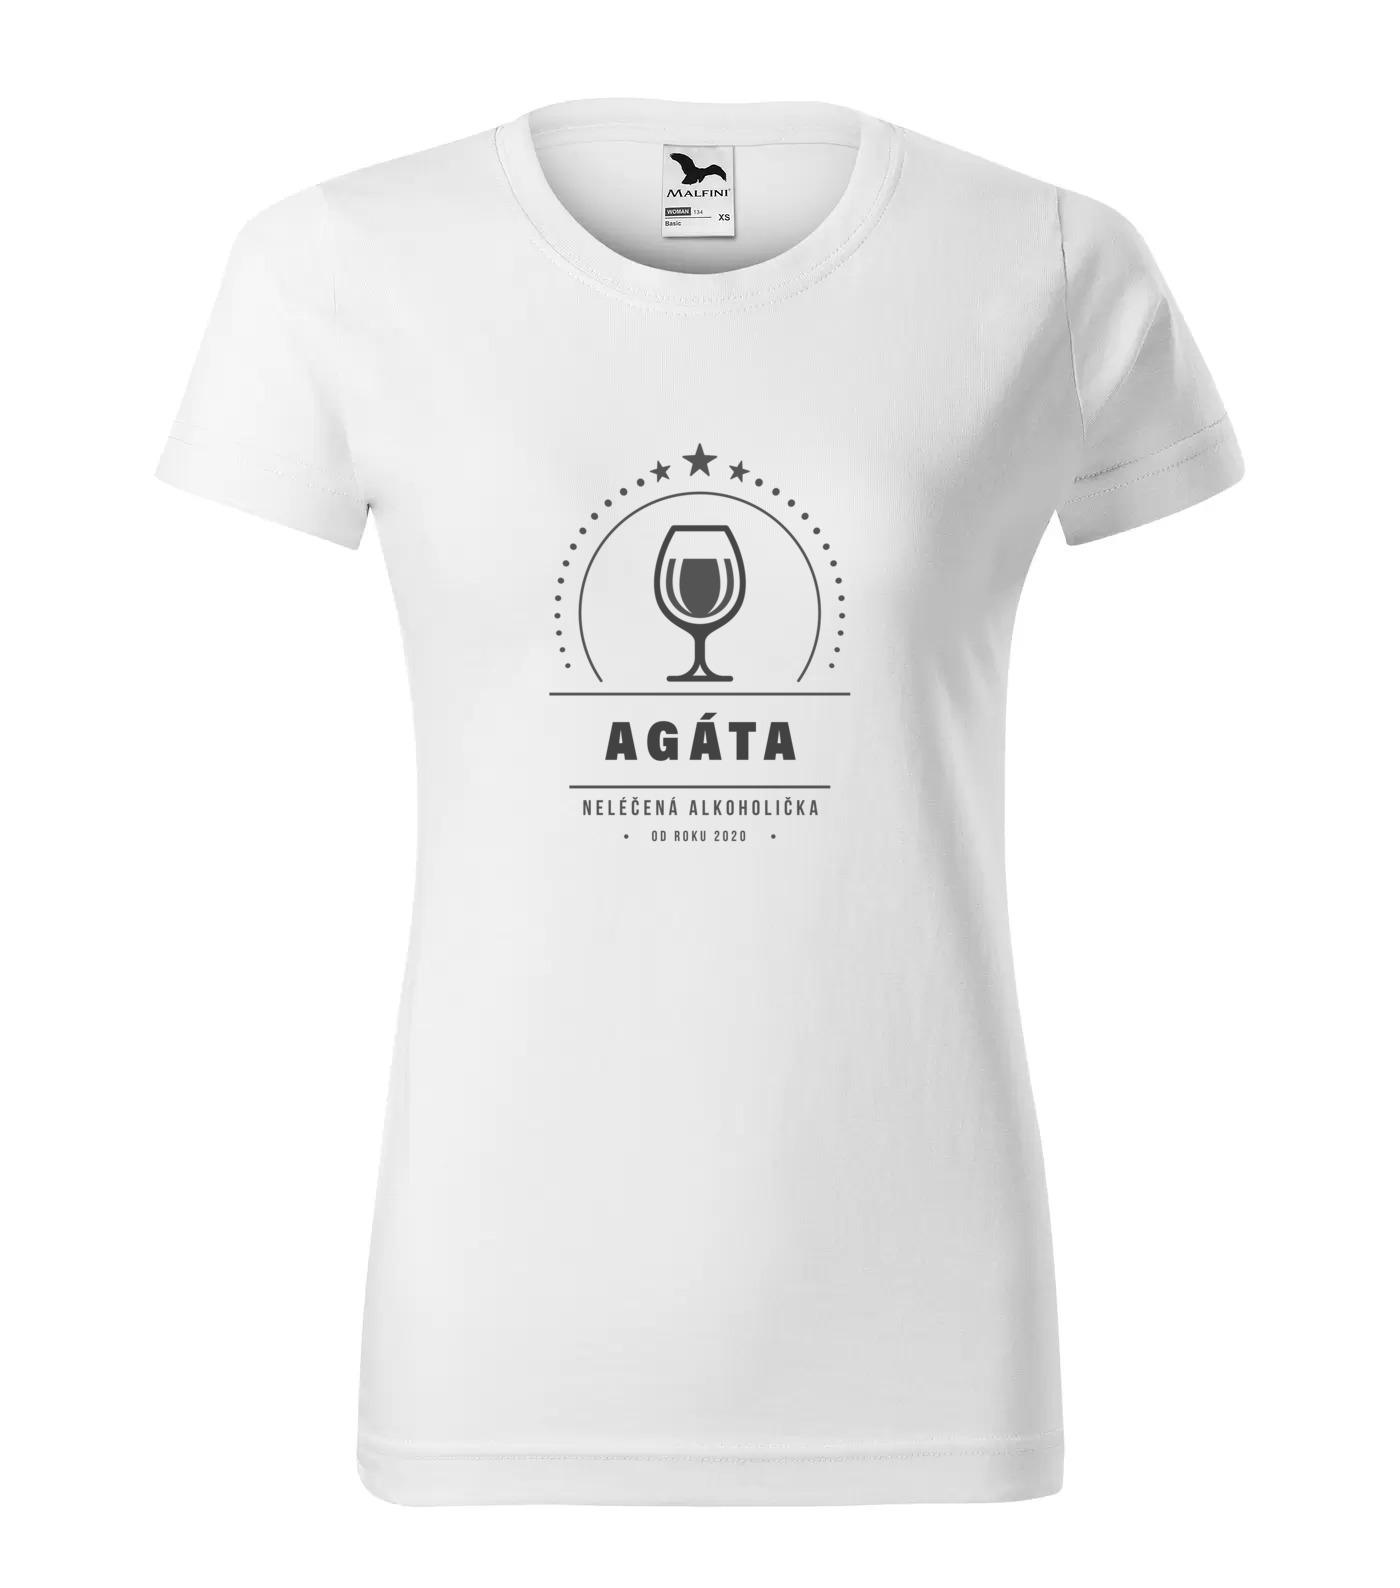 Tričko Alkoholička Agáta